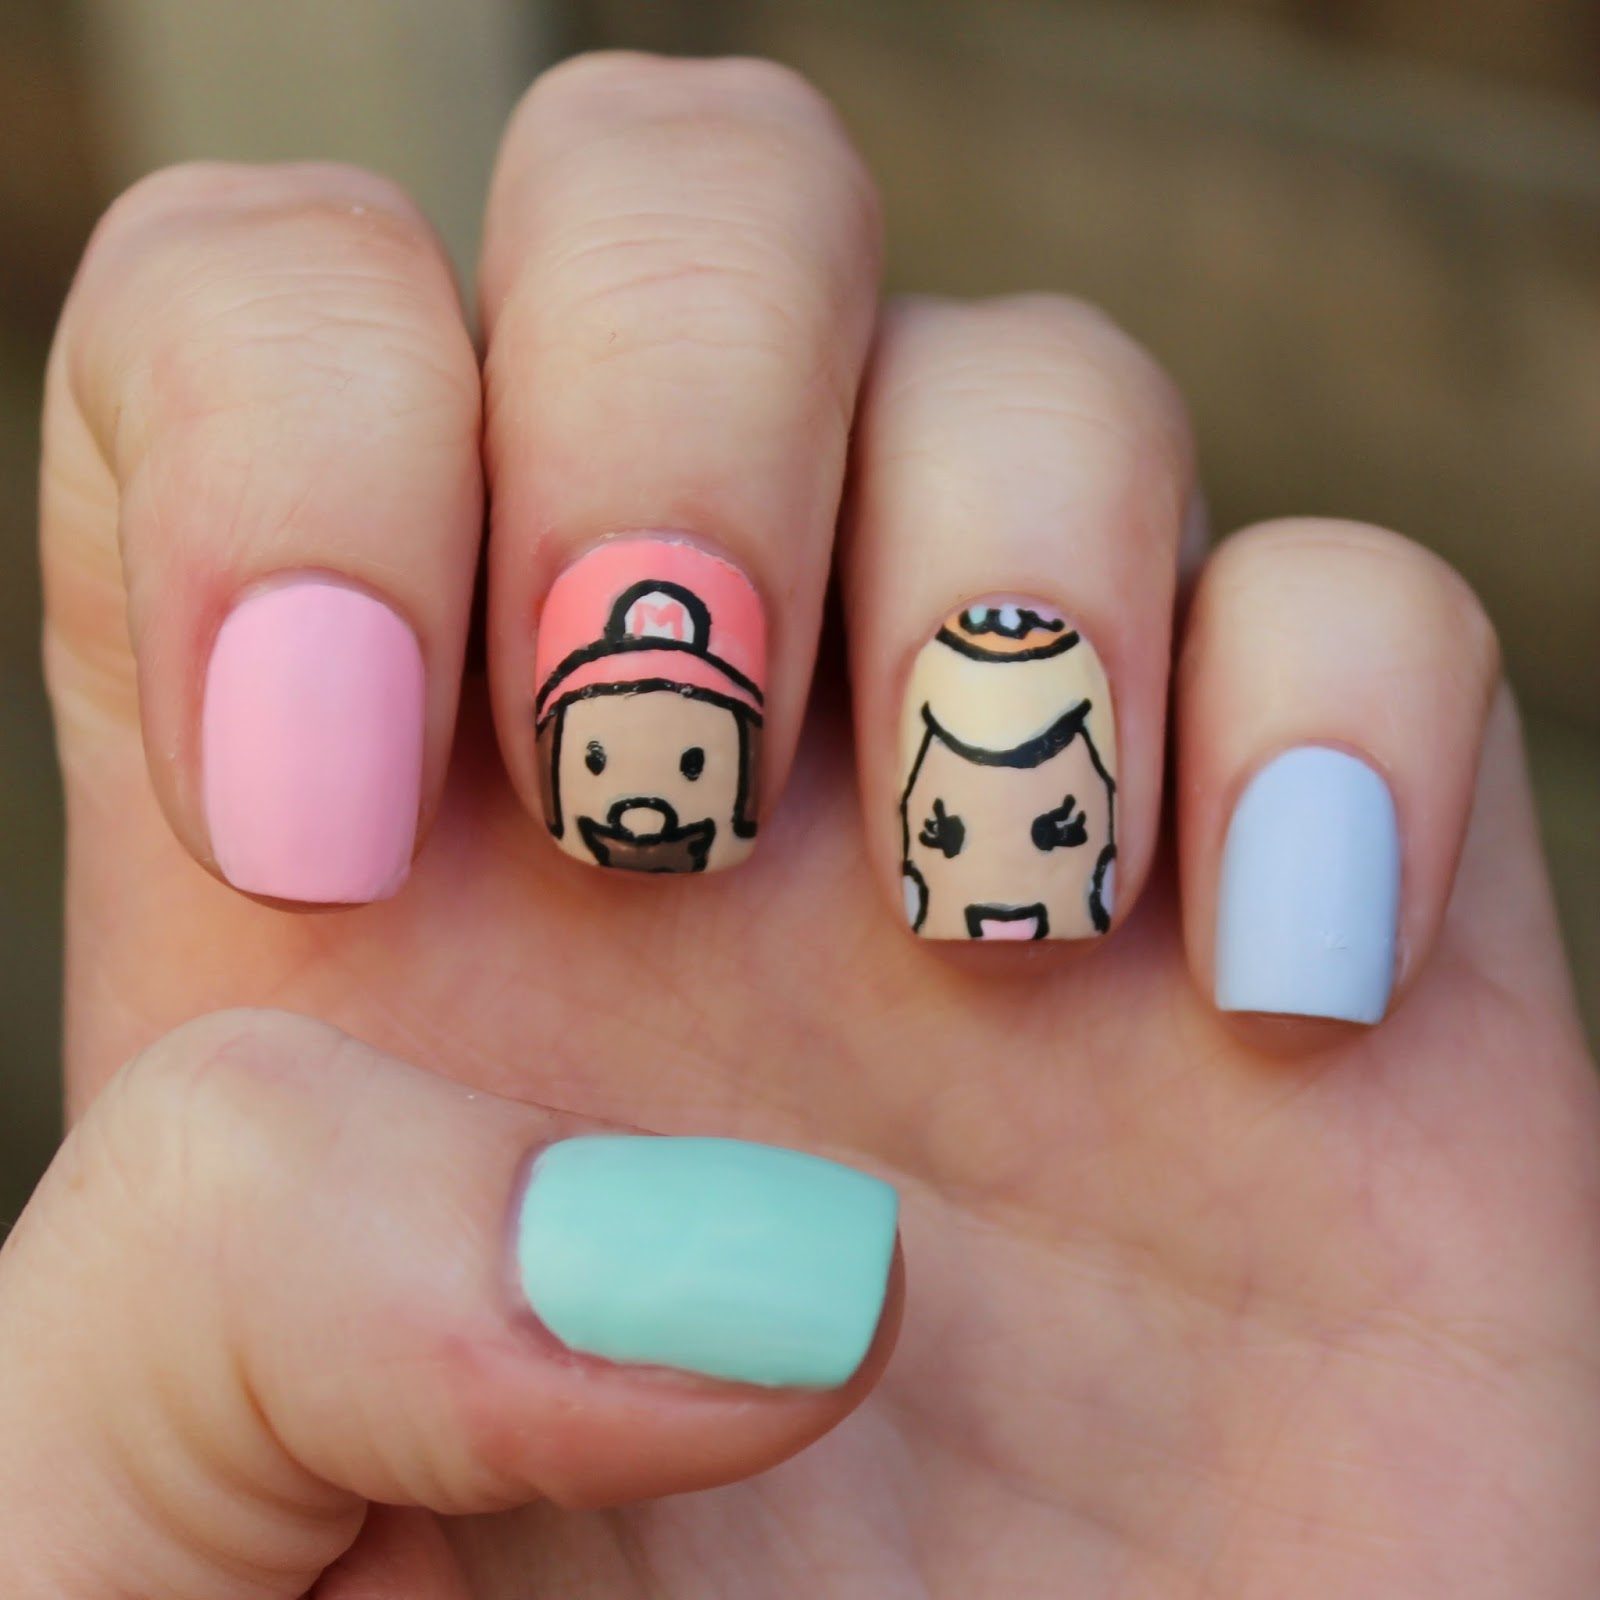 Dahlia Nails: Mario and Peach Nails